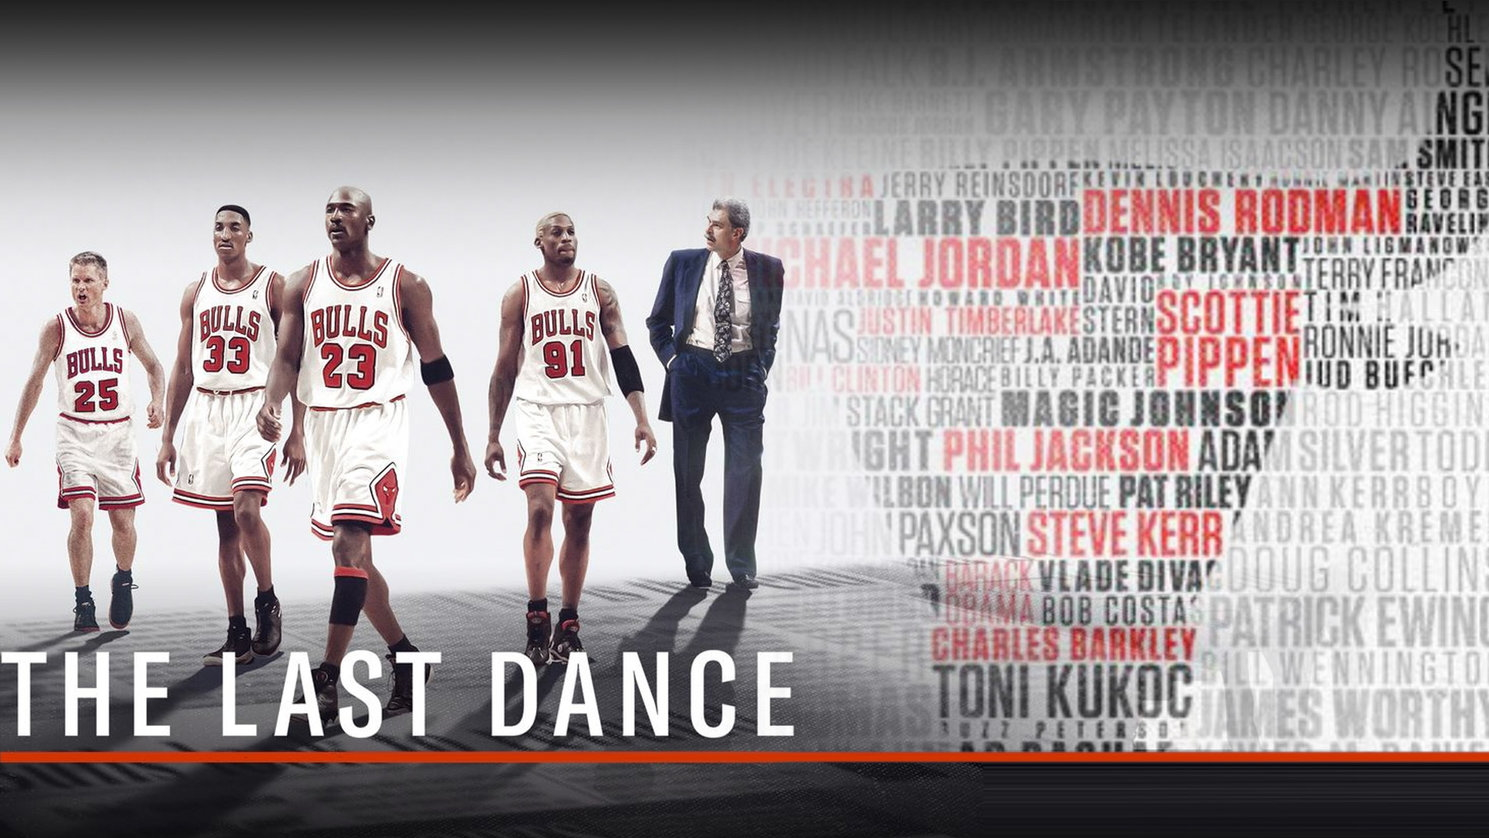 Watch The Last Dance online: stream the